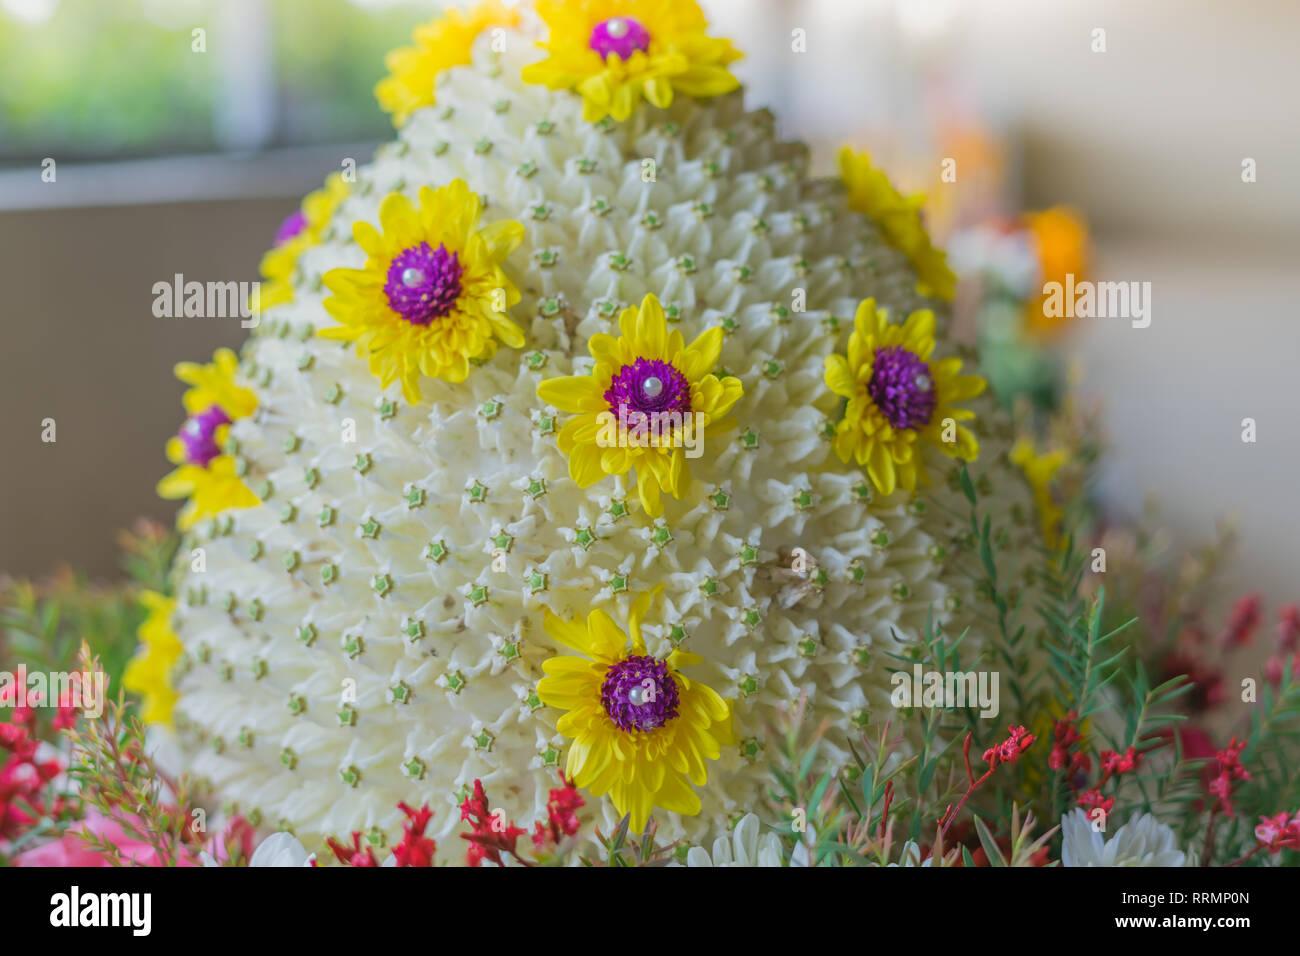 Wedding Pedestal Of Flowers Stock Photos Amp Wedding